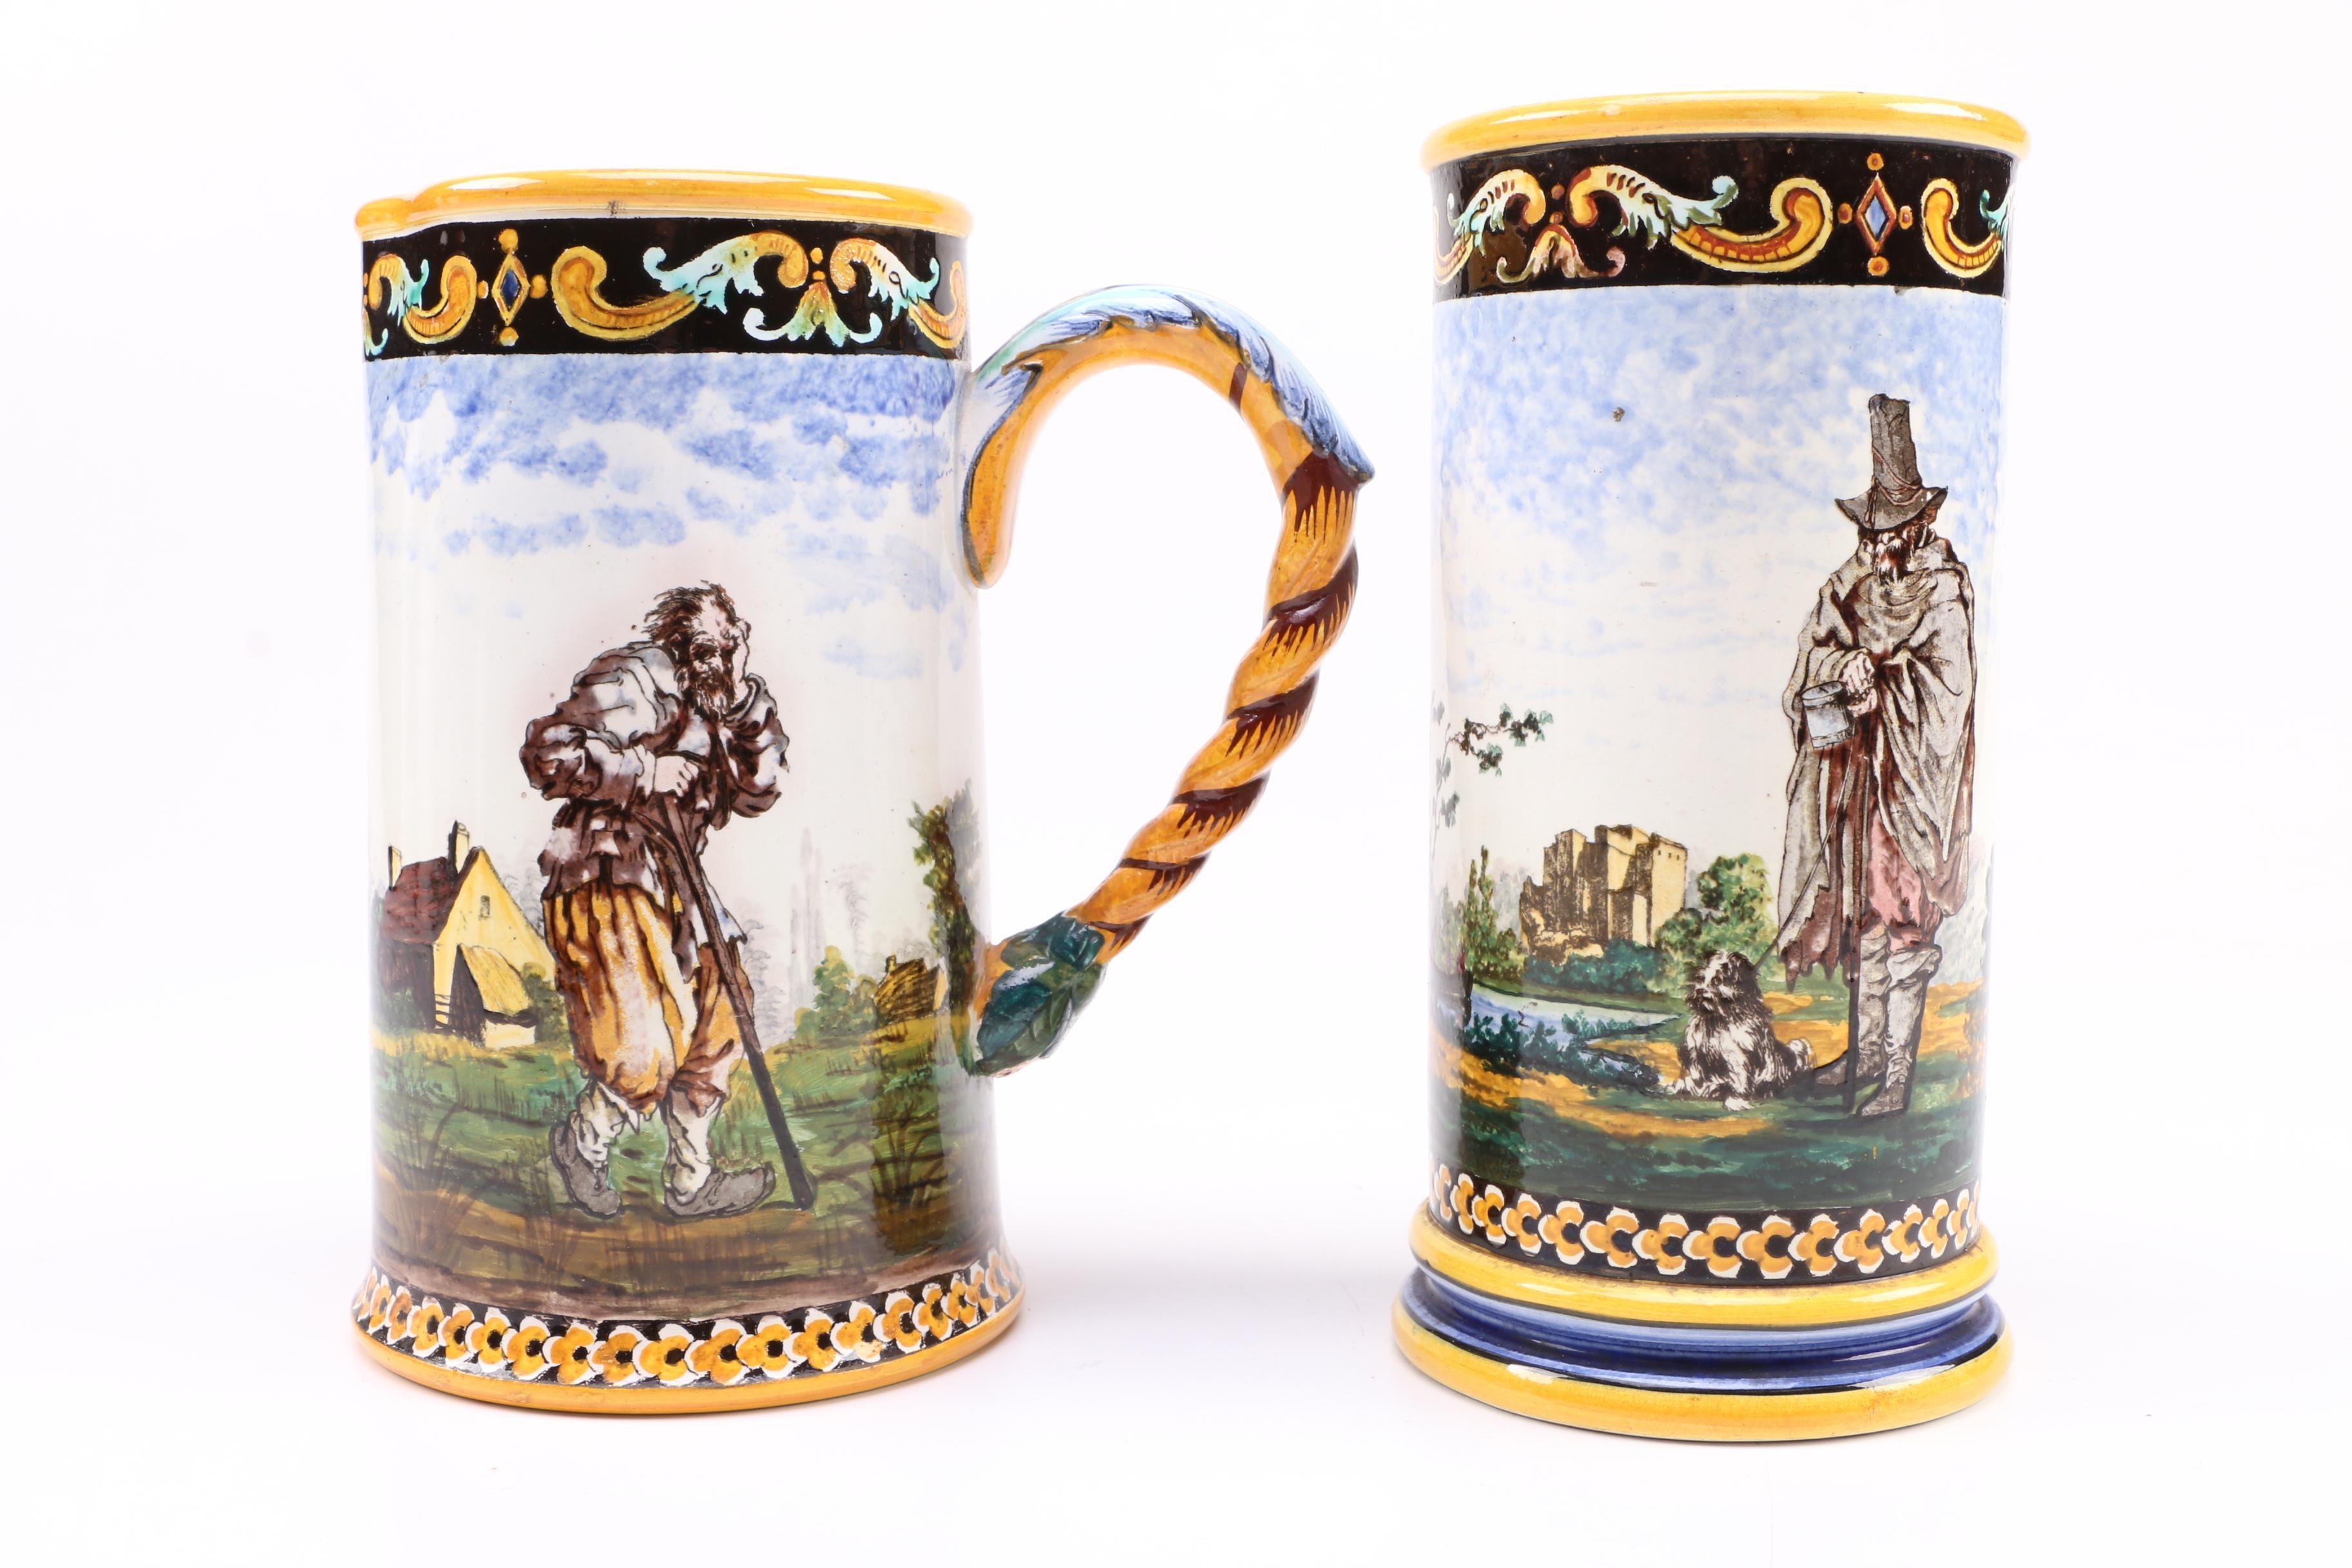 German Ceramic Vase with Pitcher